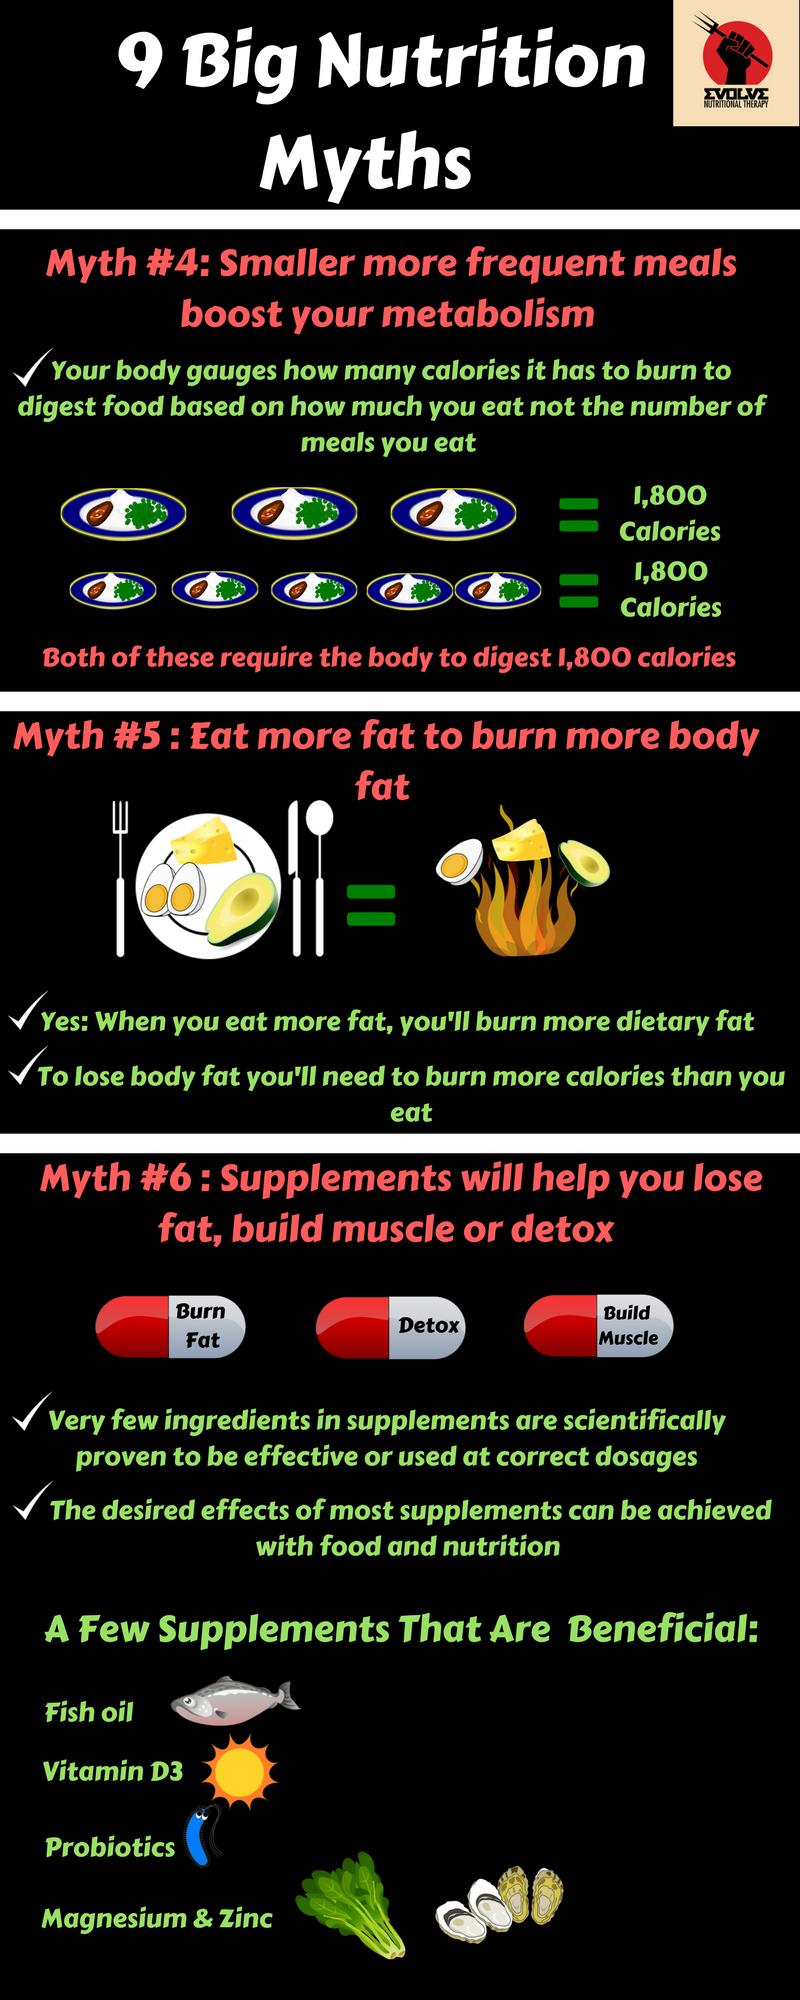 9 Big Nutrition Myths Part 2.png